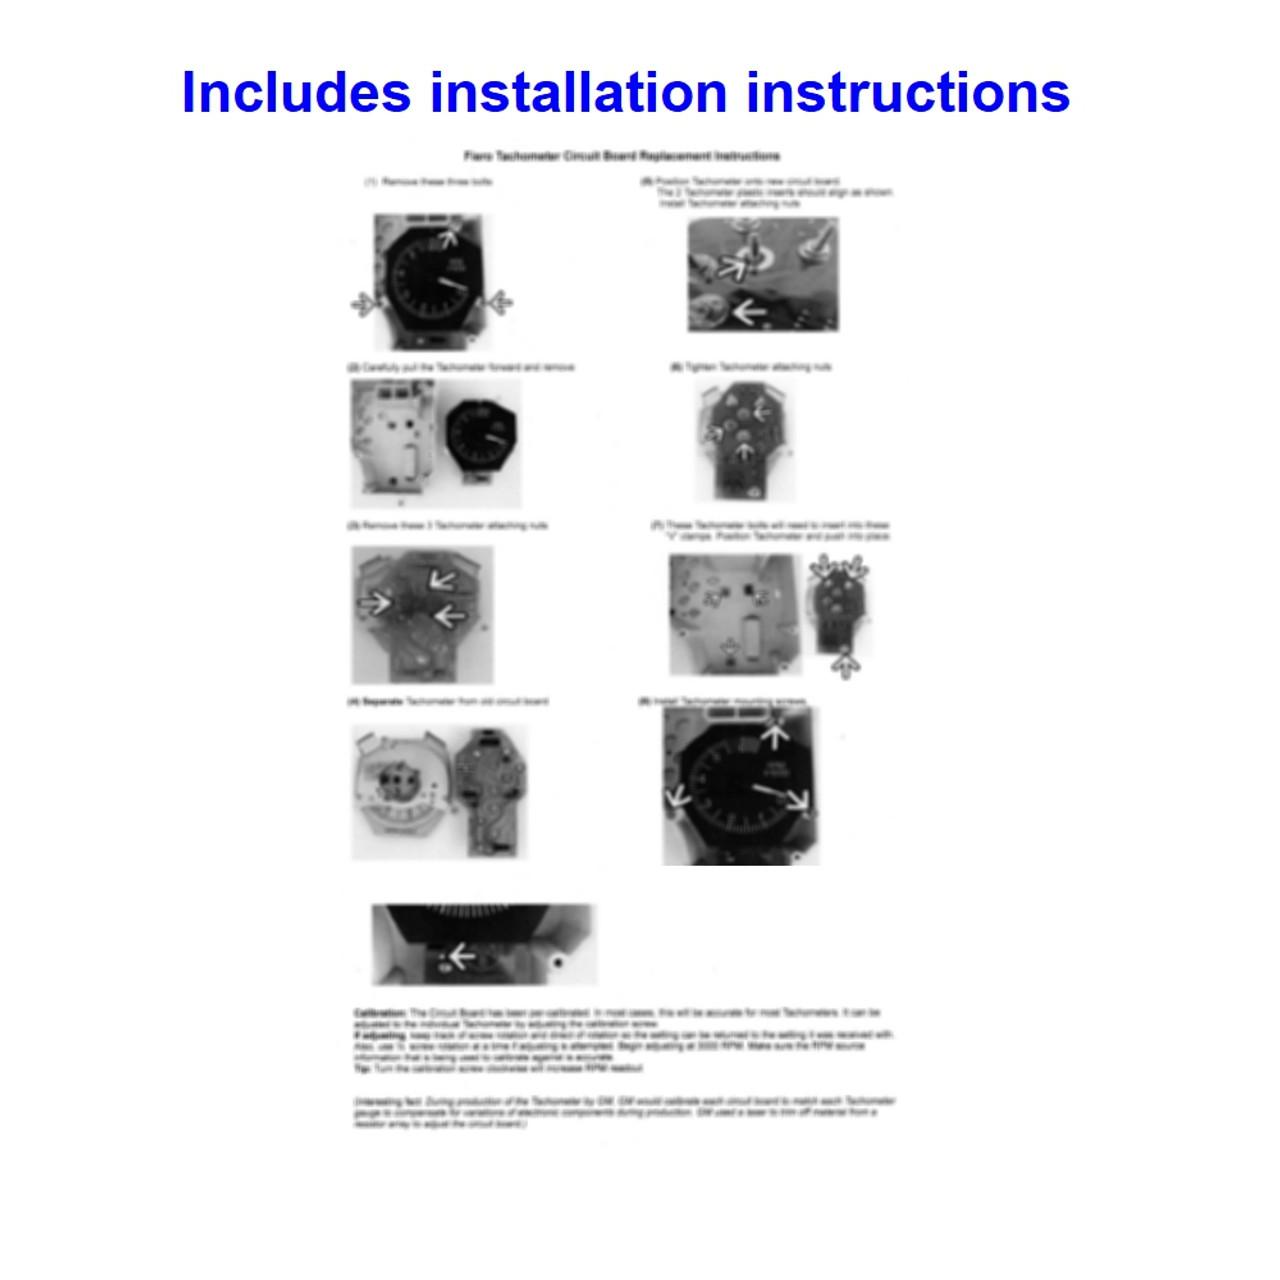 1986-88 Pontiac Fiero V6 Tachometer Circuit Board. Installation instructions